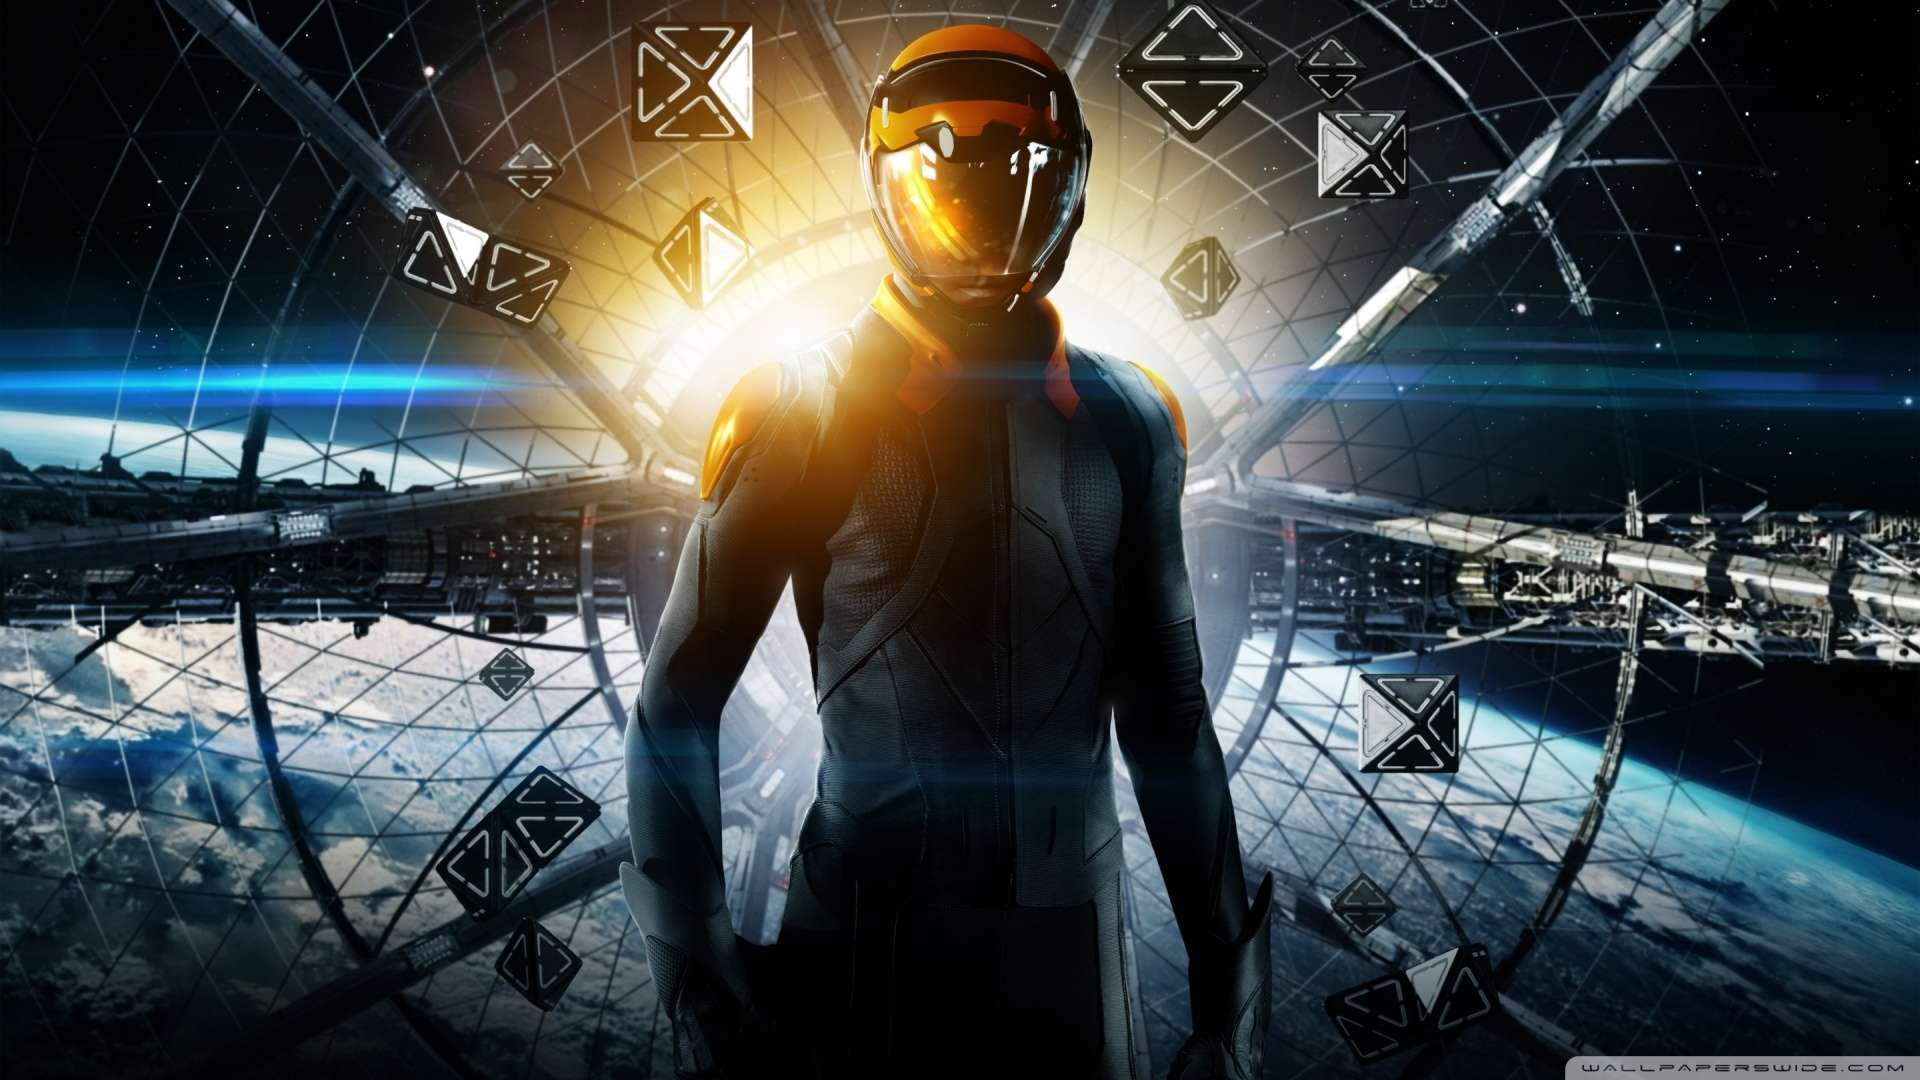 HD Sci Fi Wallpapers 1080p